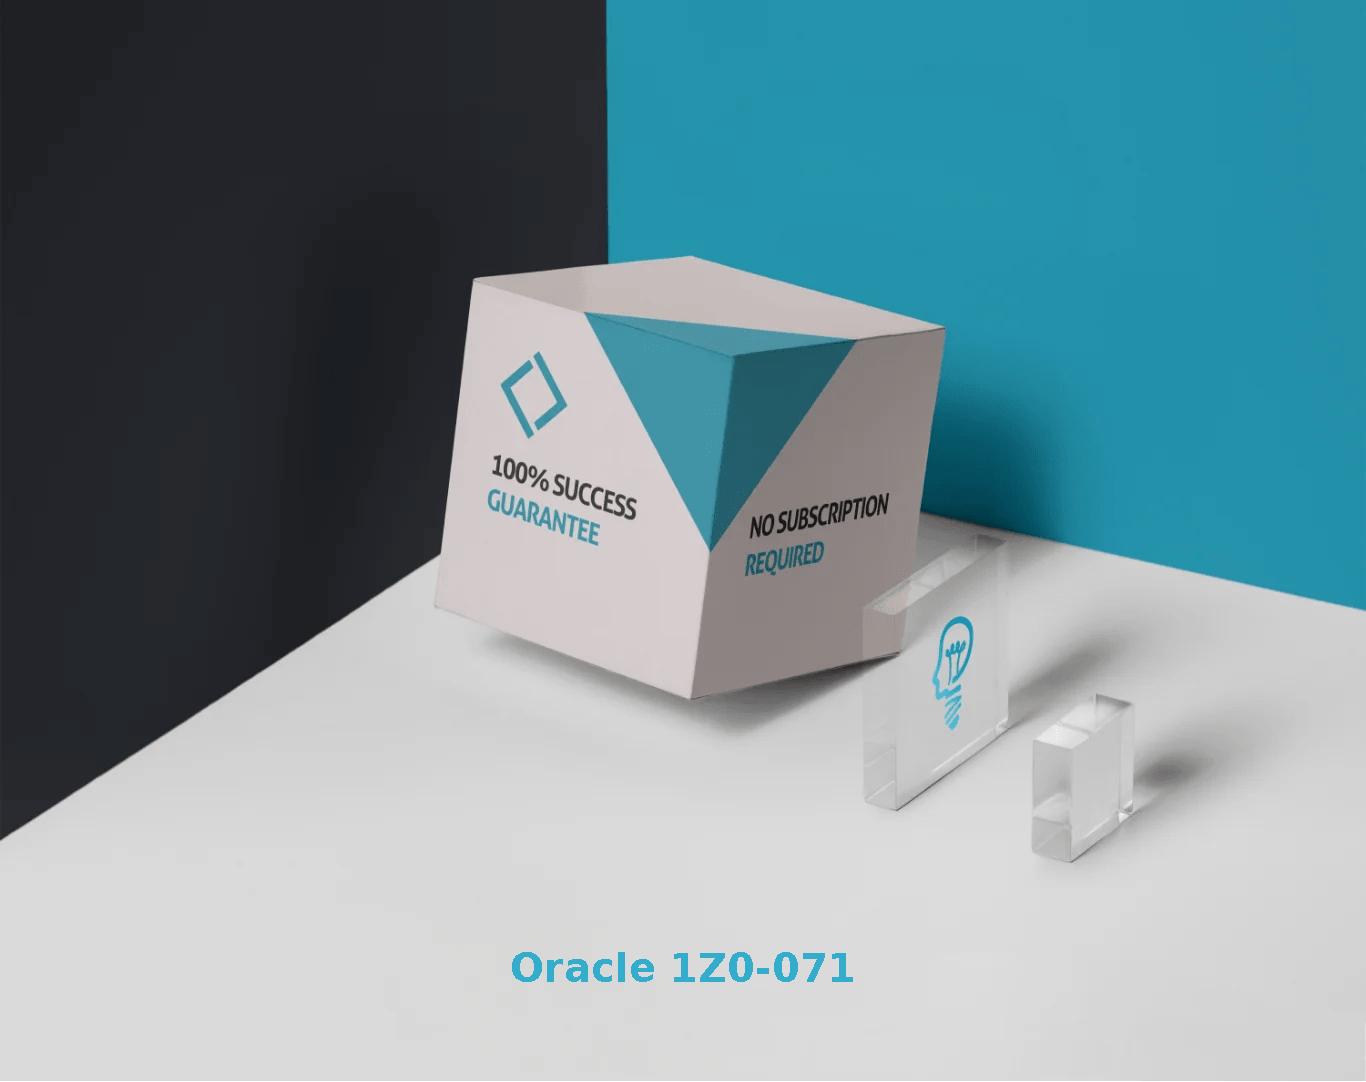 Oracle 1Z0-071 Exams